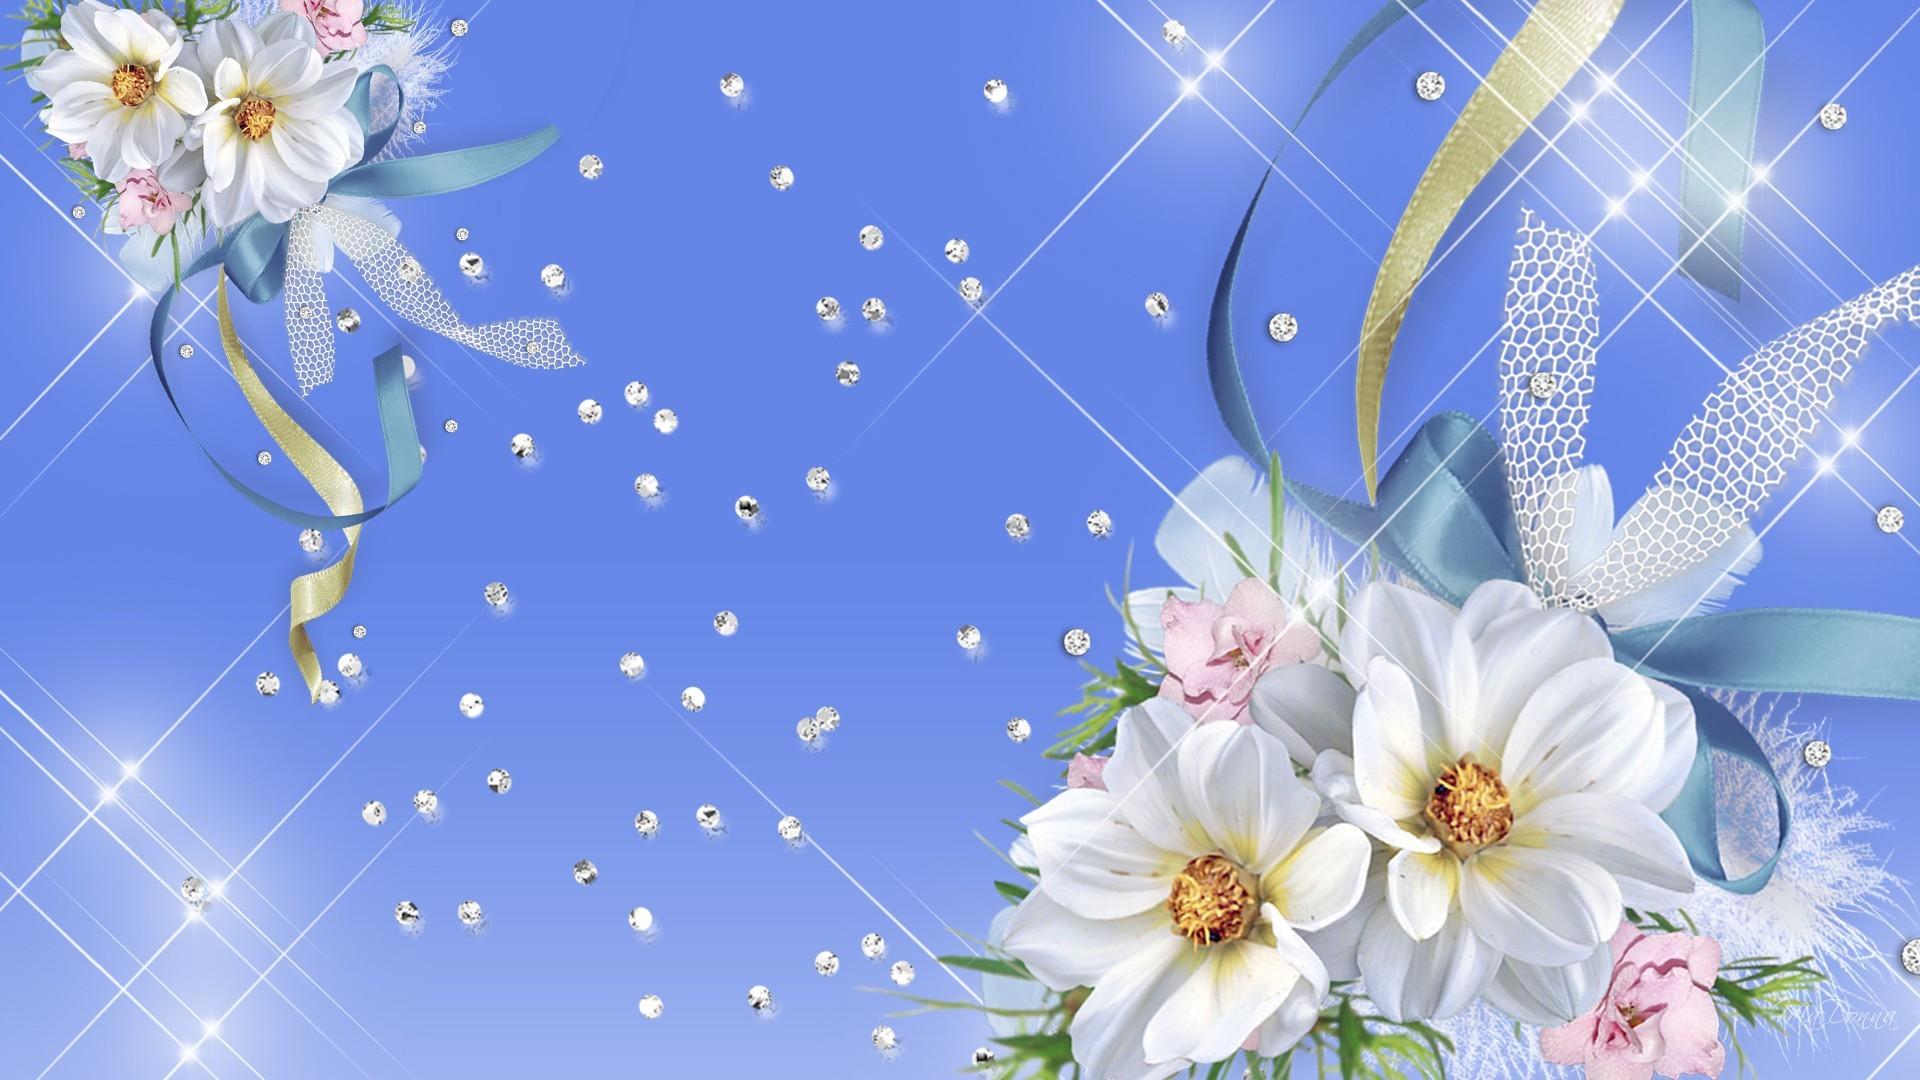 … blue and white flower wallpaper flowers ideas …